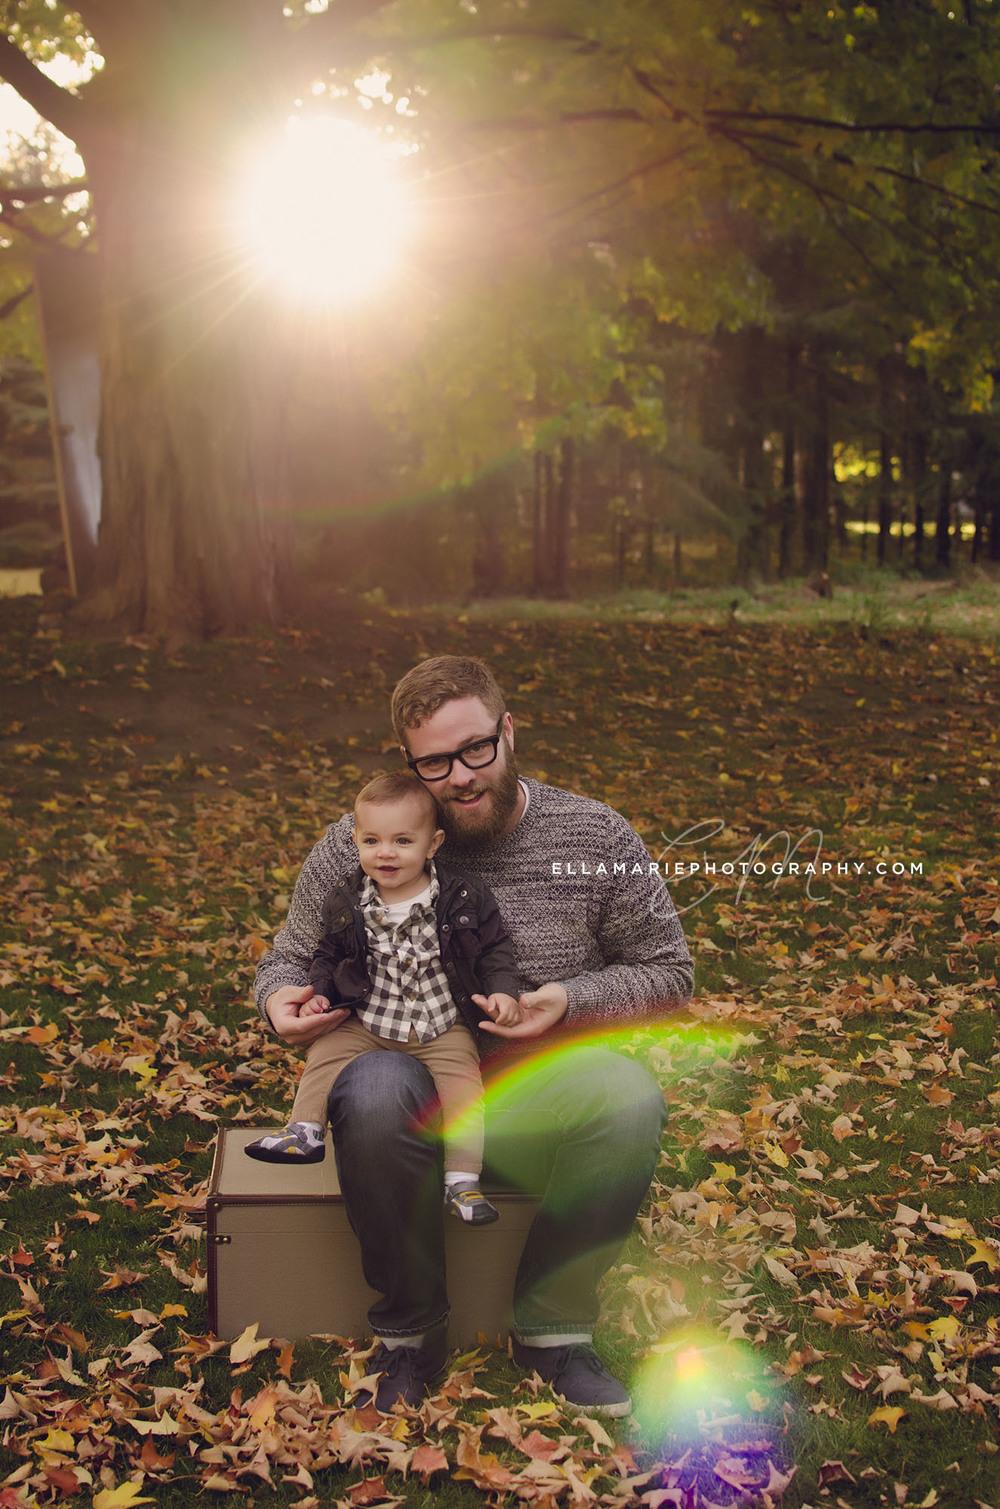 Erika_EllaMariePhotography_family_Baden_ON_New_Hamburg_Stratford_Waterloo_Kitchener_Guelph_Cambridge_Listowel_photographer_photography_13.jpg